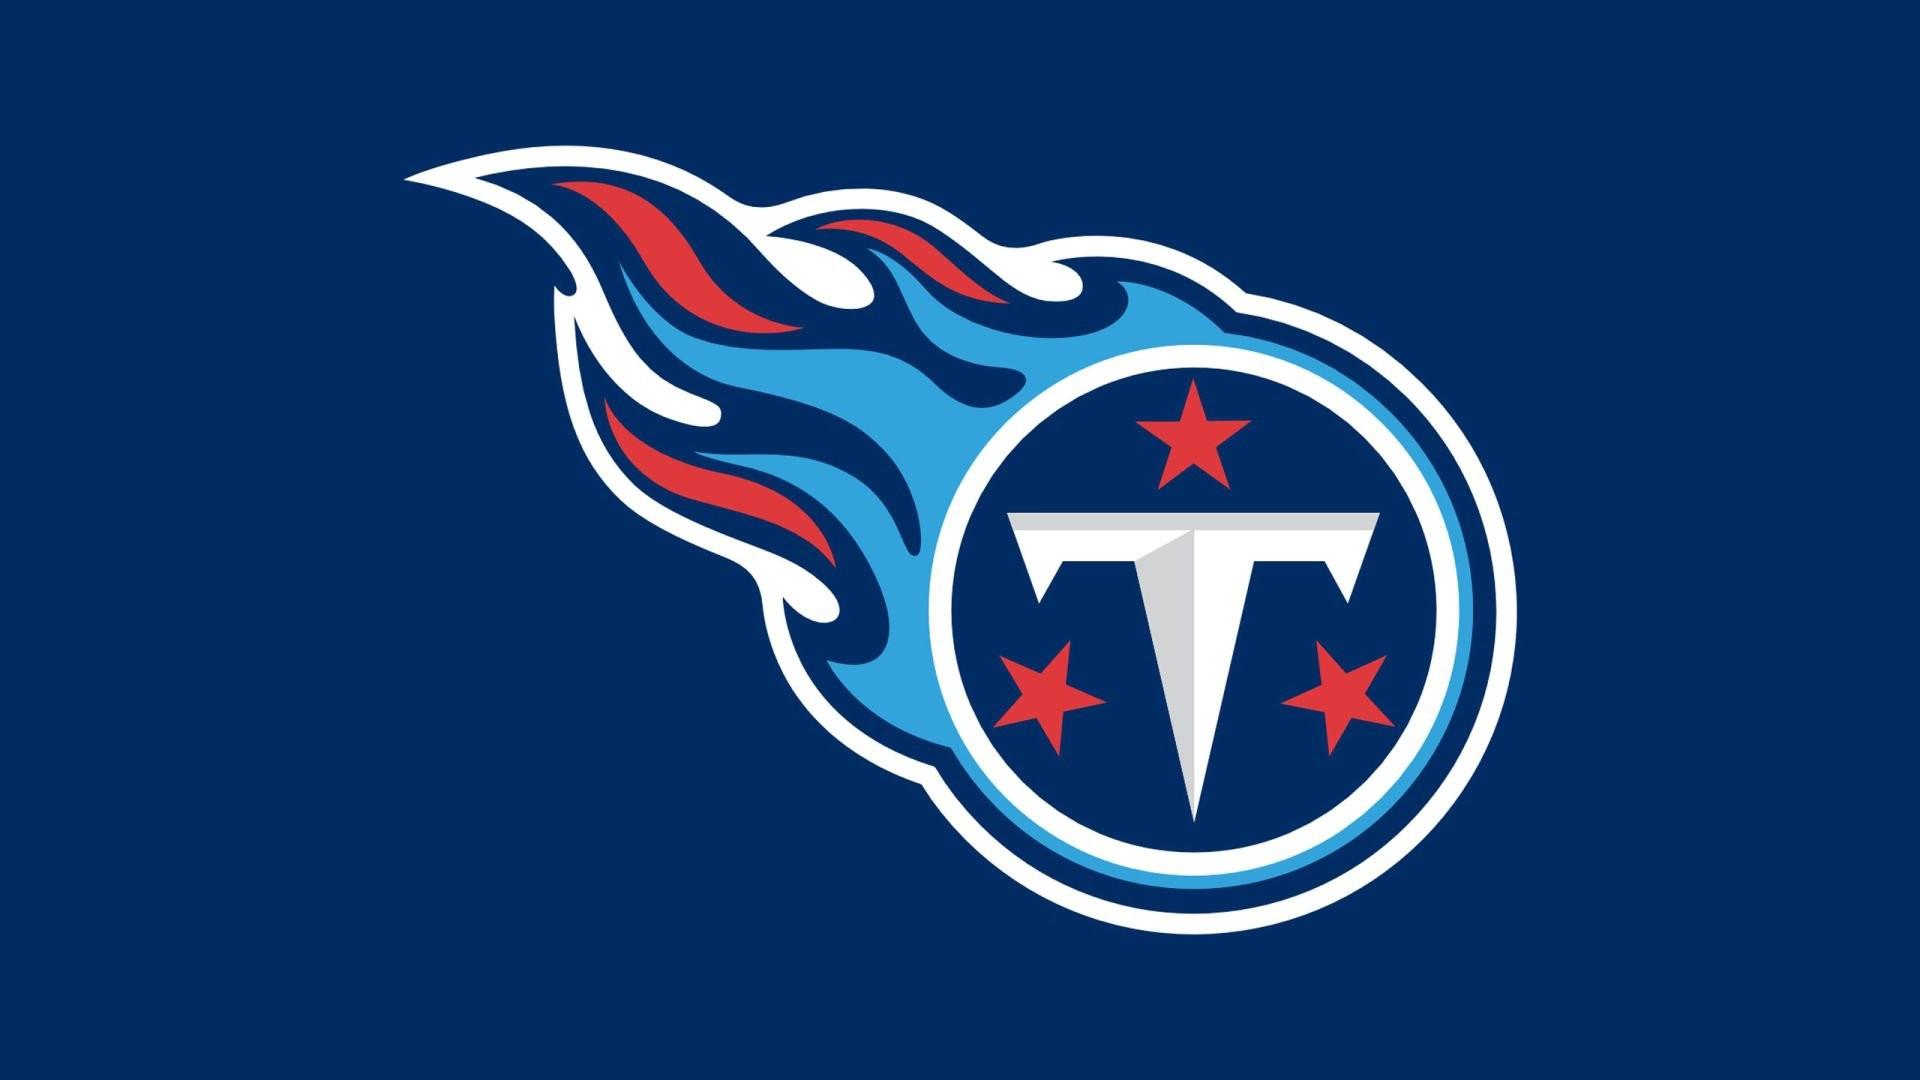 Res: 1920x1080, HD Sports Logo Photos Free.